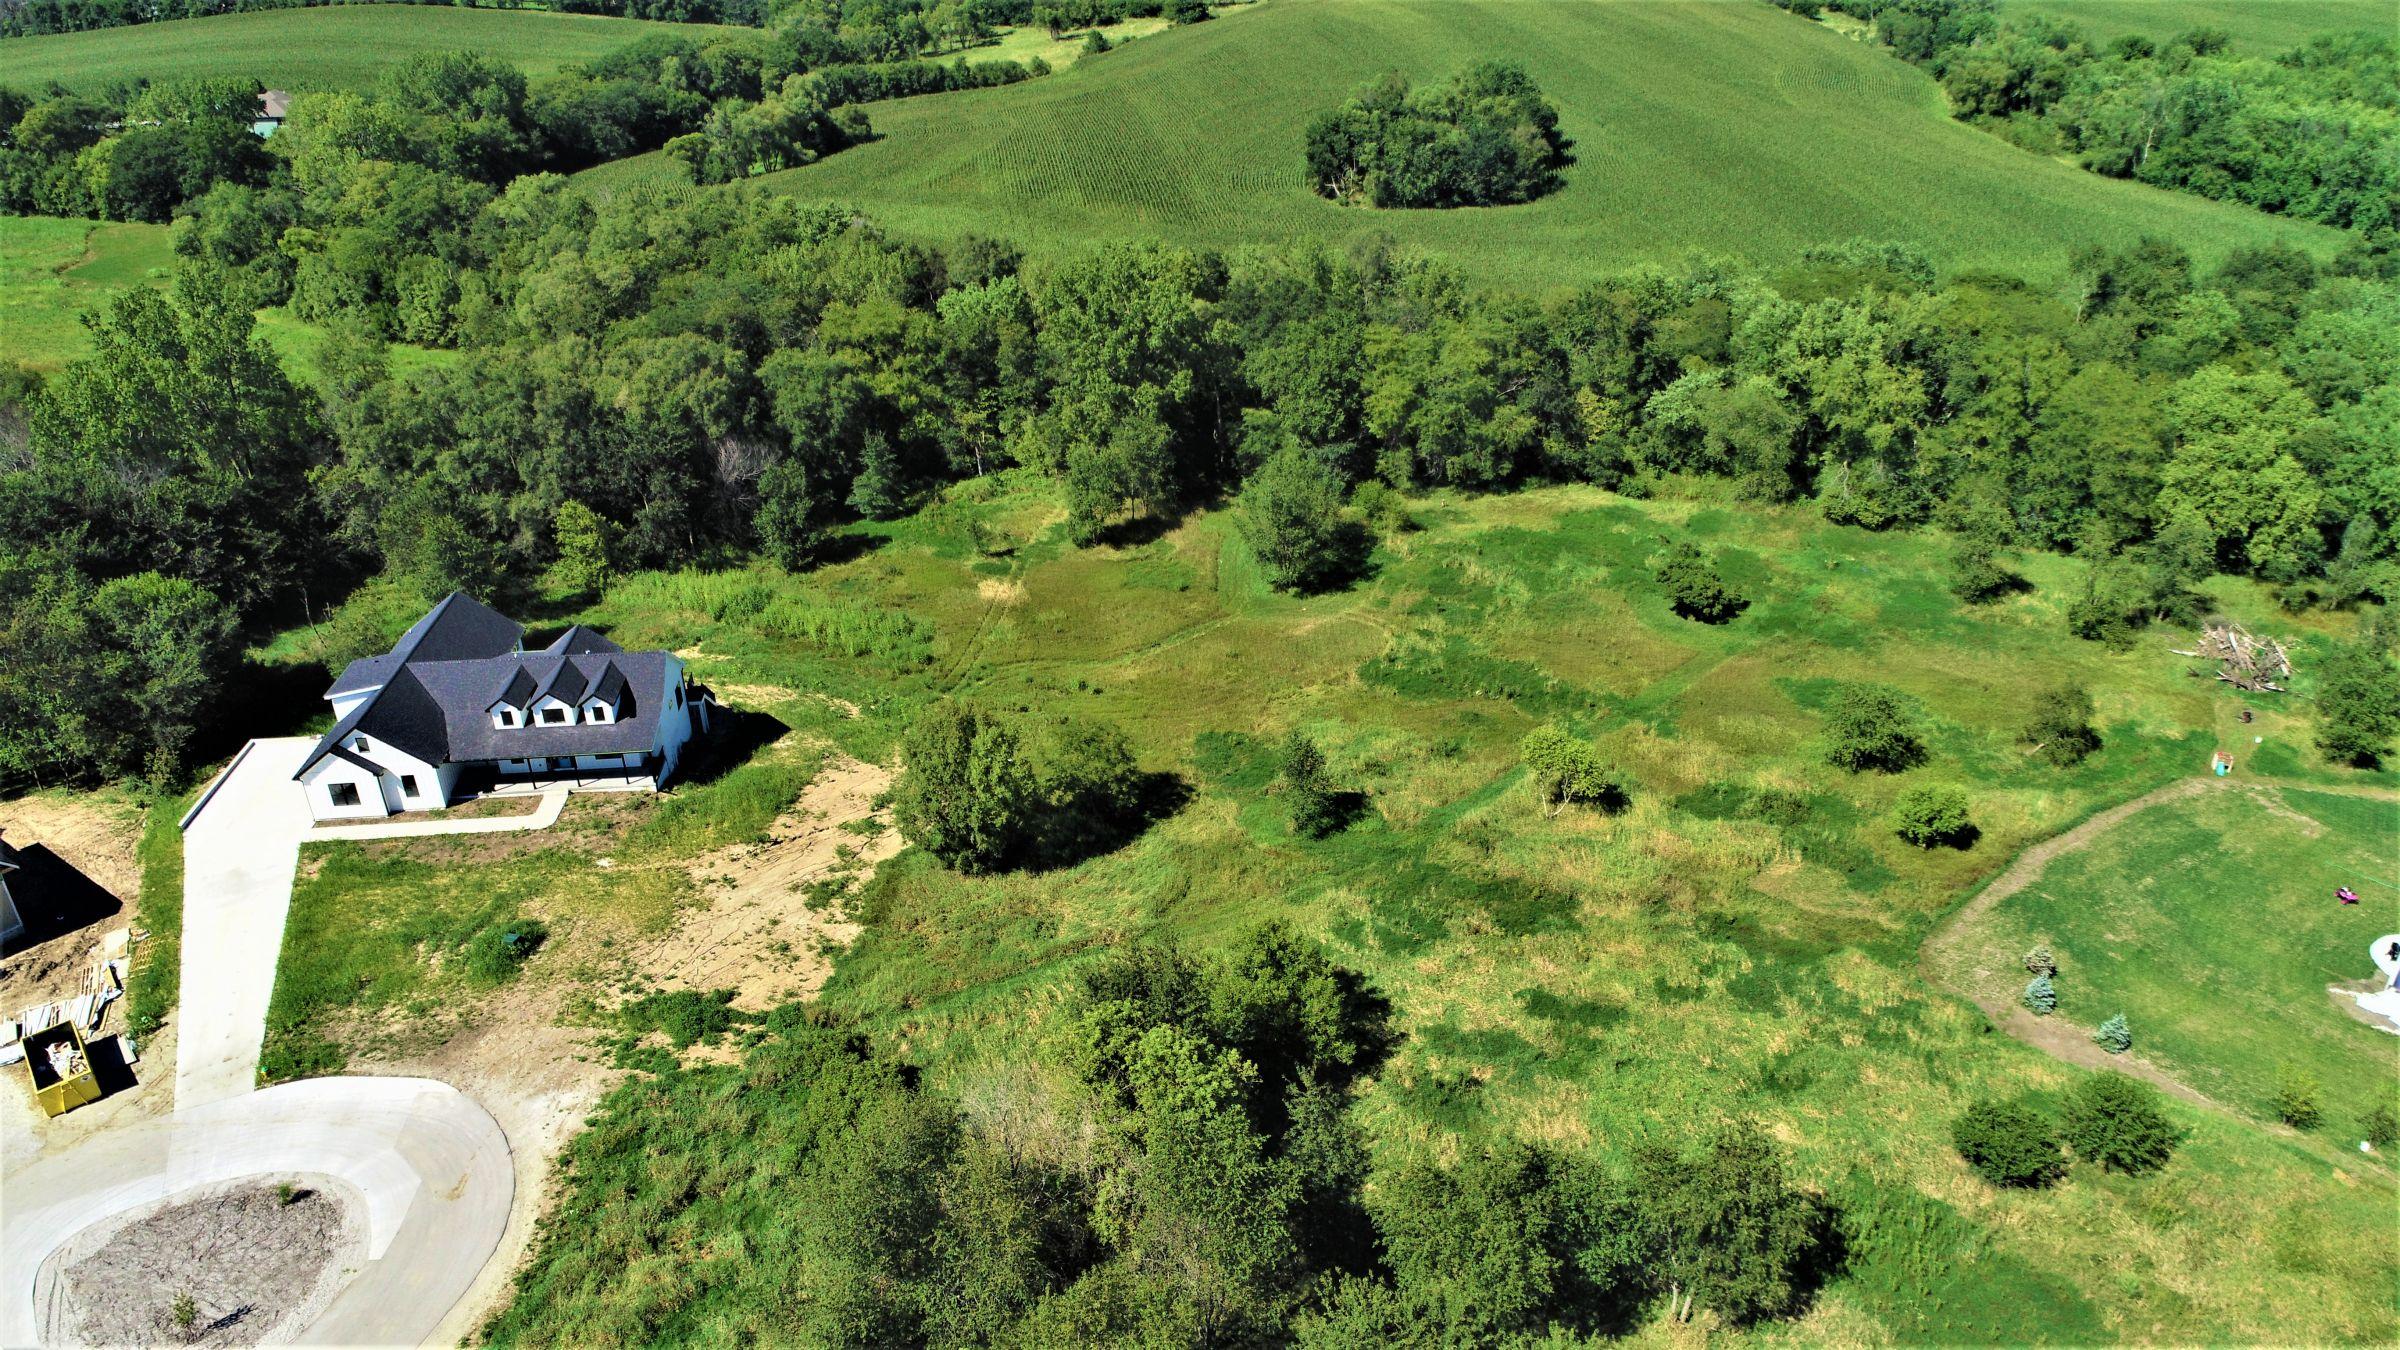 development-land-warren-county-iowa-2-acres-listing-number-15699-1-2021-08-20-205835.JPG